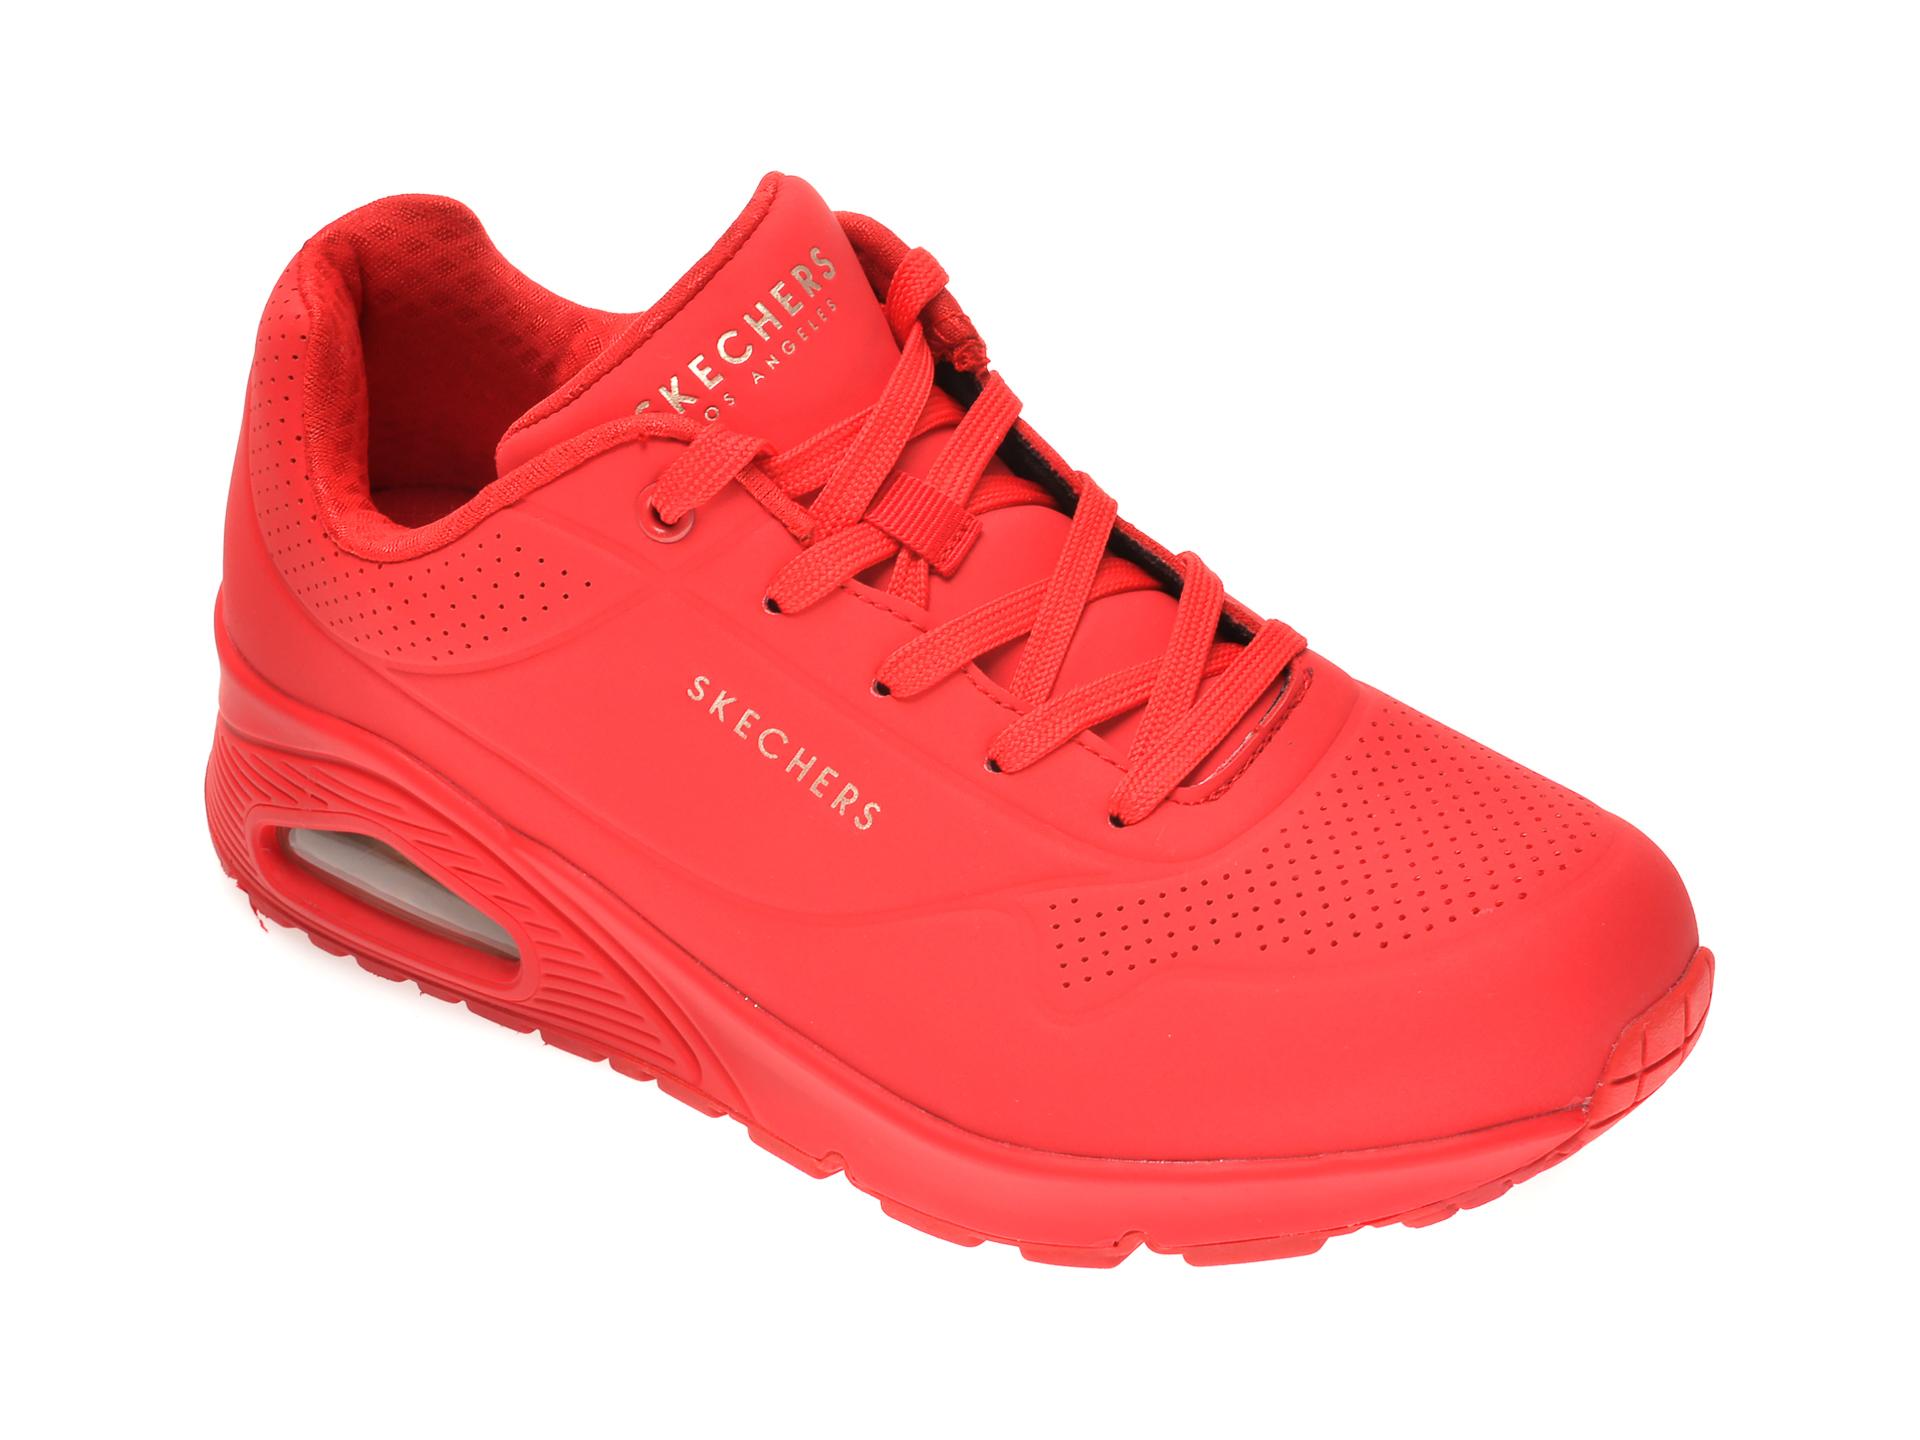 Pantofi Sport Skechers Rosii, Uno Stand On Air, Din Piele Ecologica